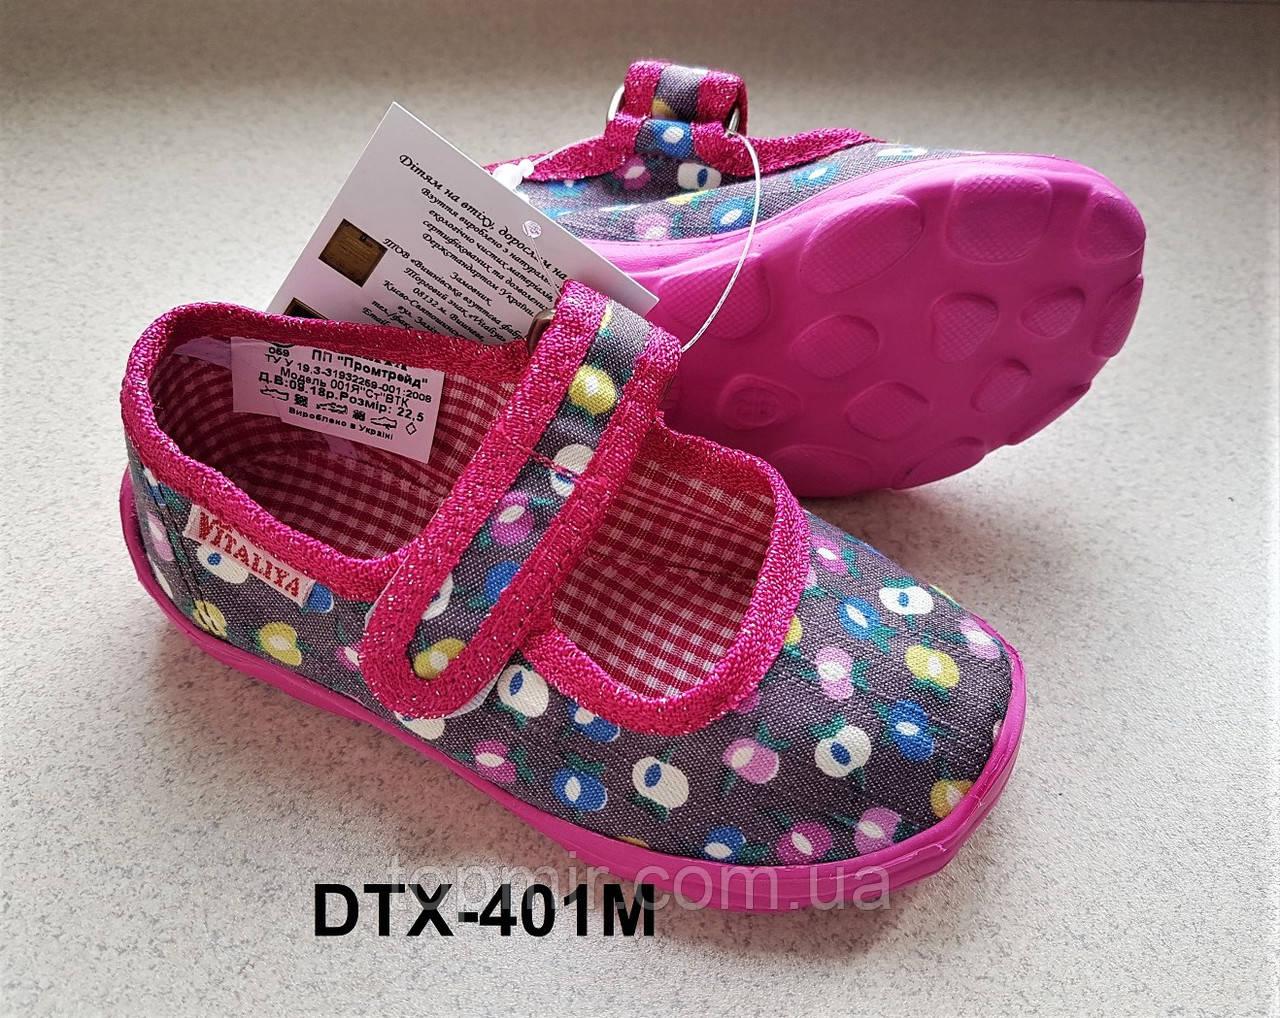 fac9e0f45e81 Детские тапочки для малышек ТМ Vitaliya для дома и улицы - Интернет- магазин  обуви